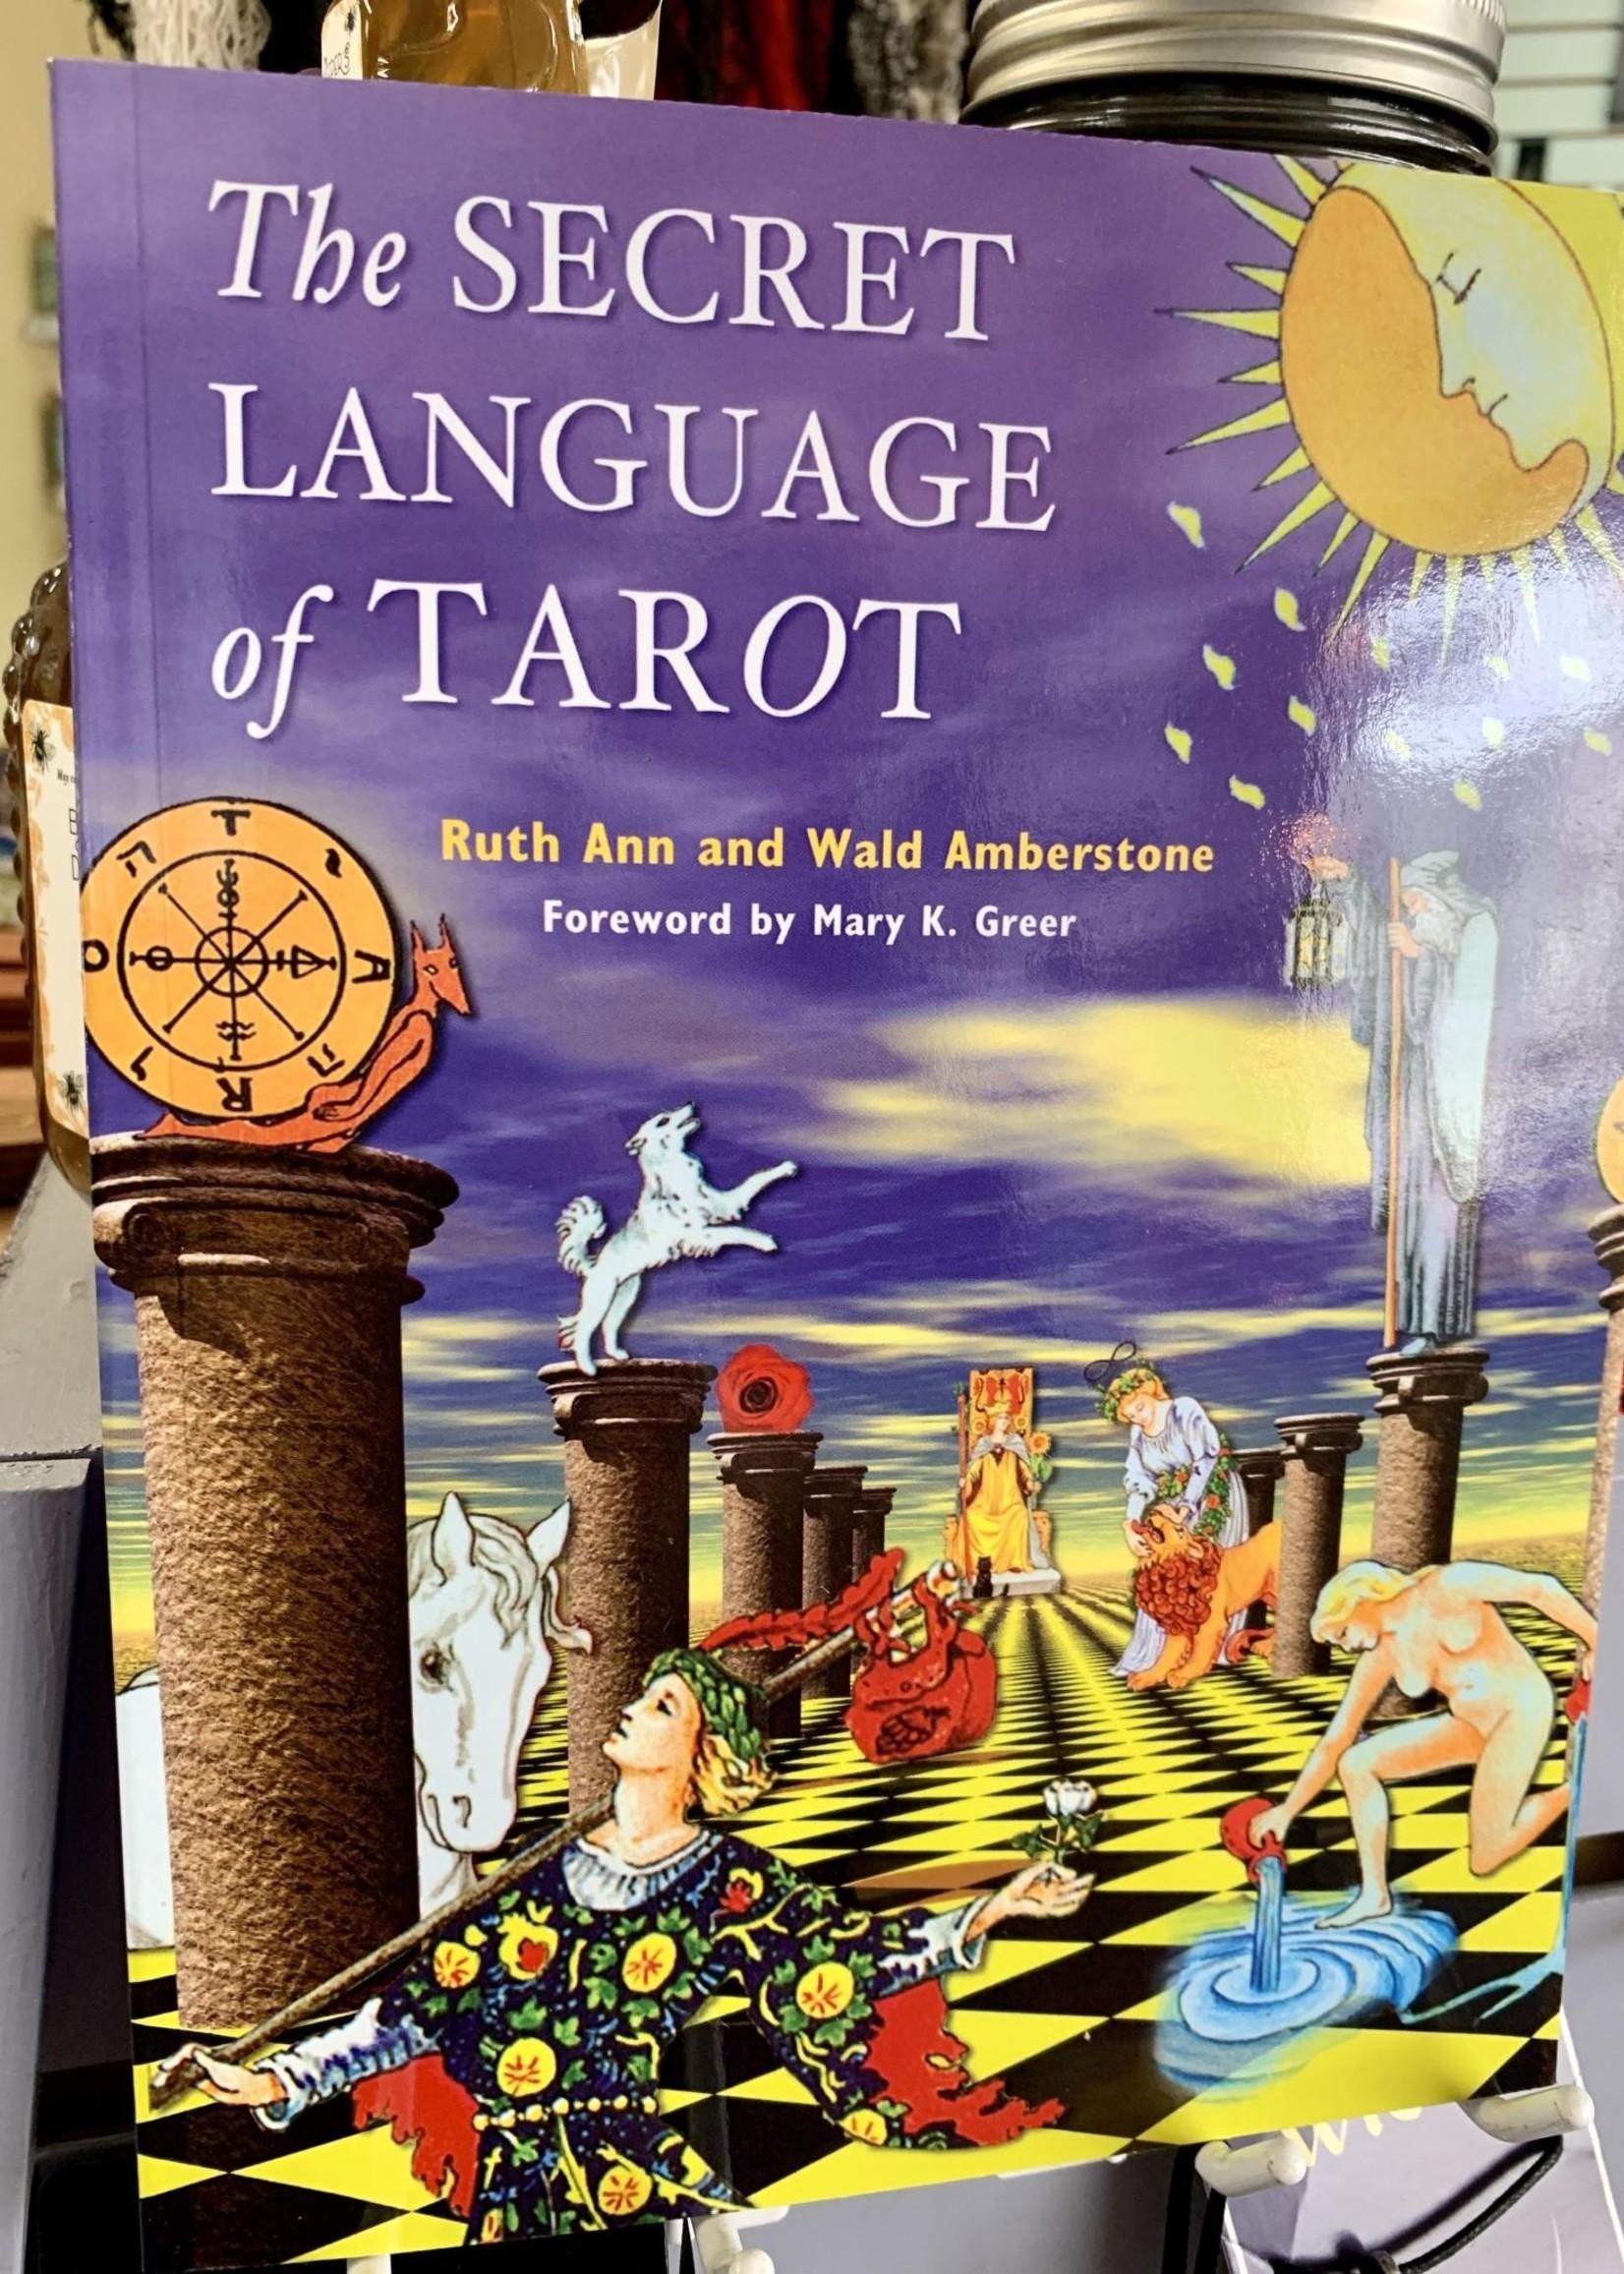 The Secret Language of Tarot - Ruth Ann & Wald Amberstone